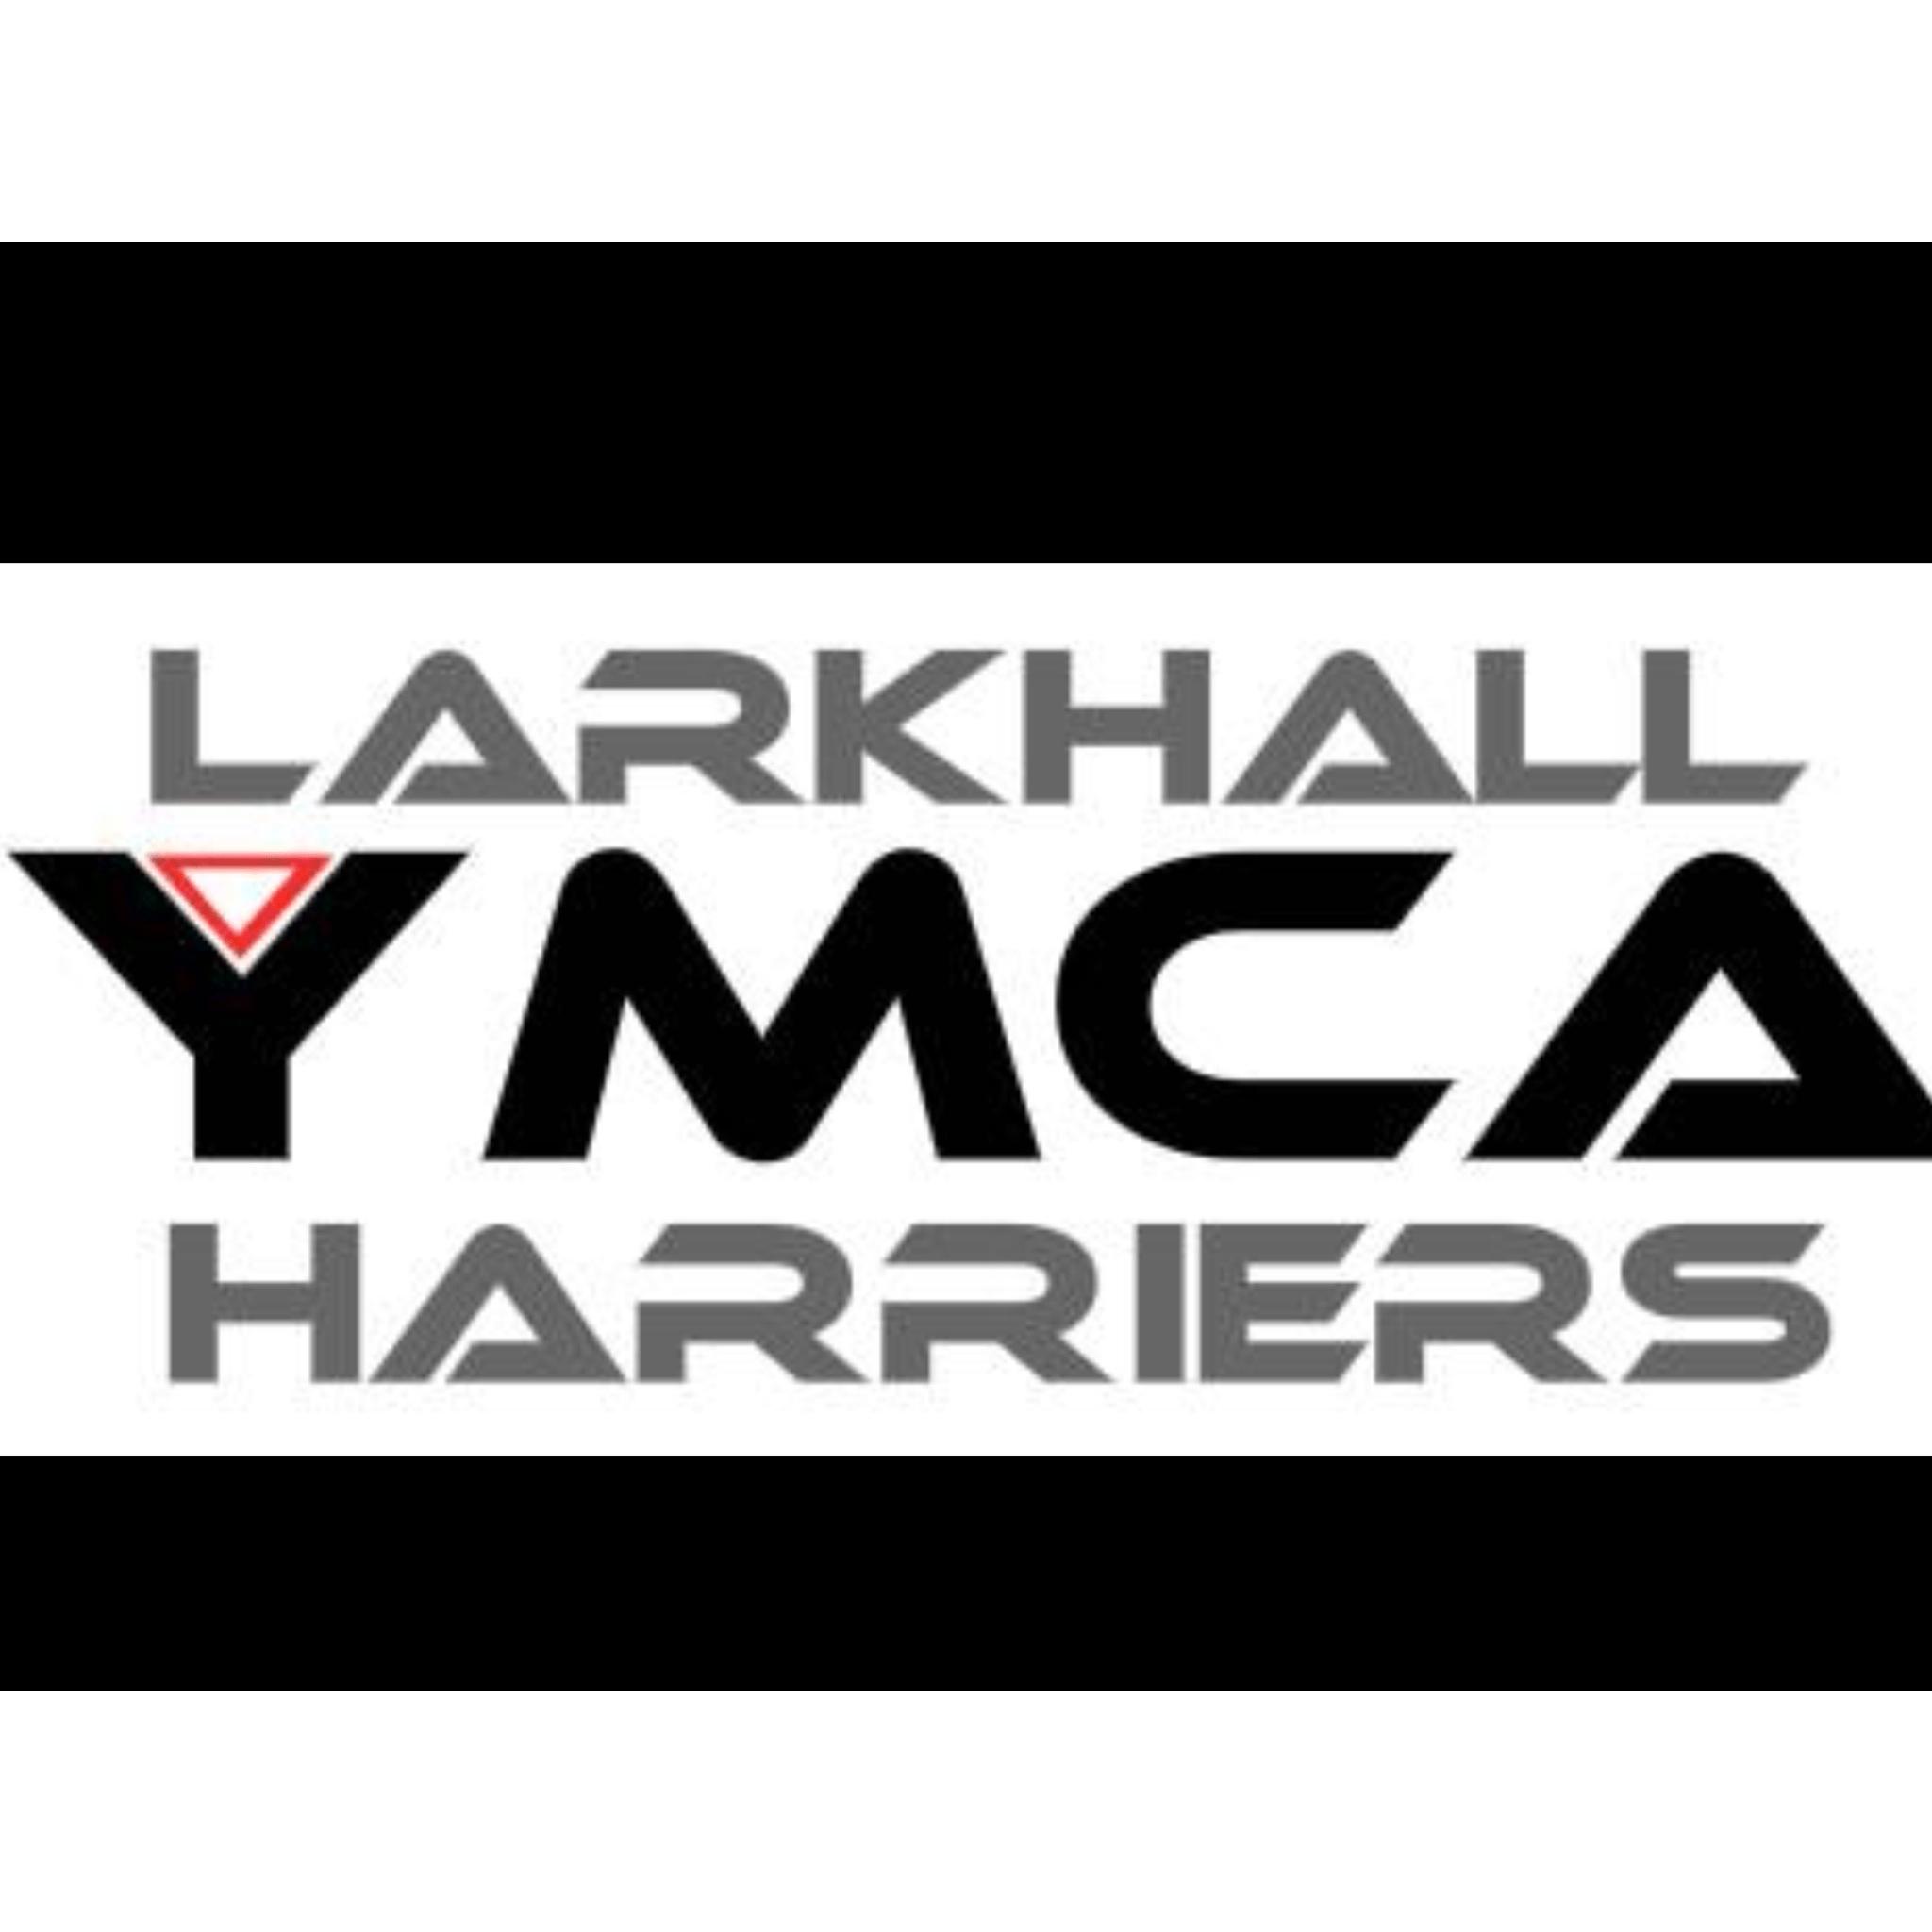 Larkhall YMCA Harriers